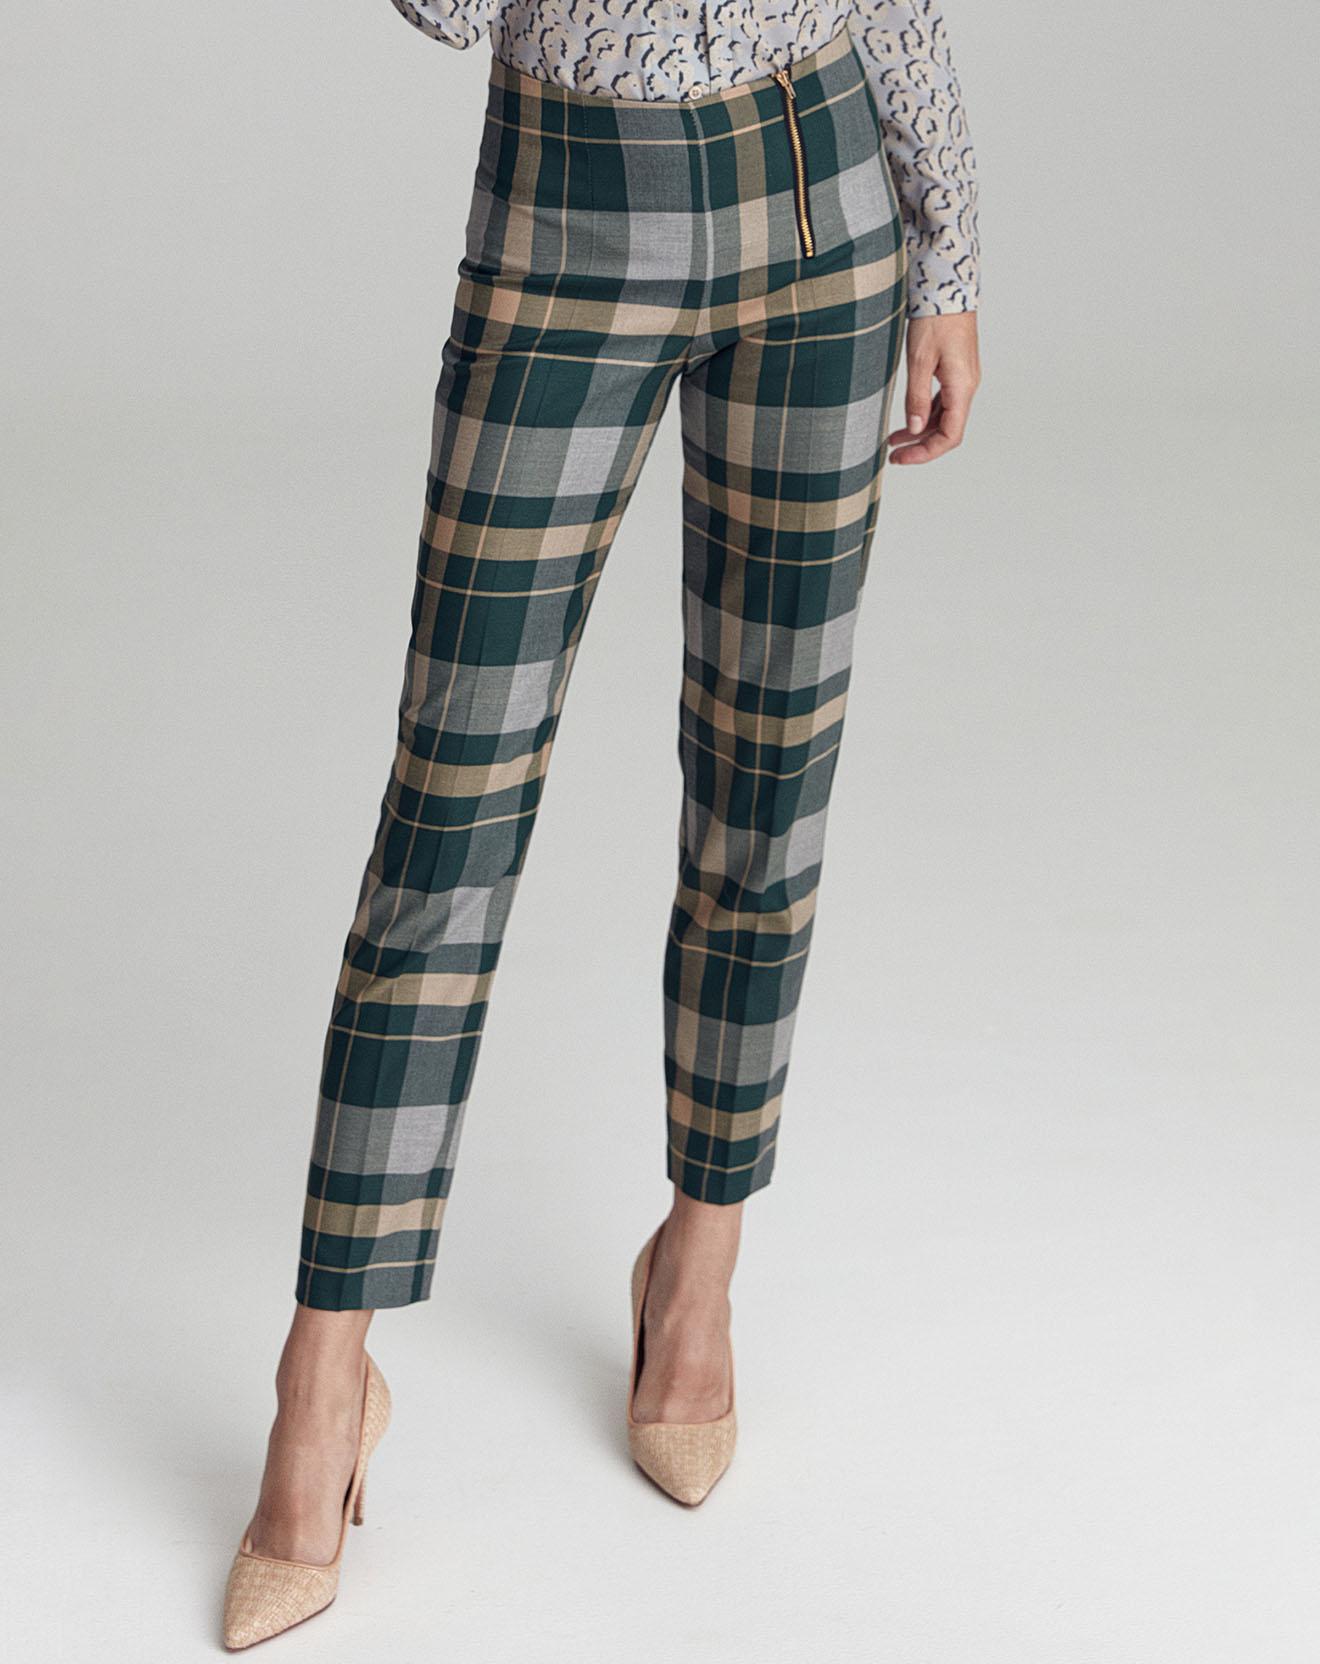 Pantalon Dominique vert/jaune/gris - Nife - Modalova